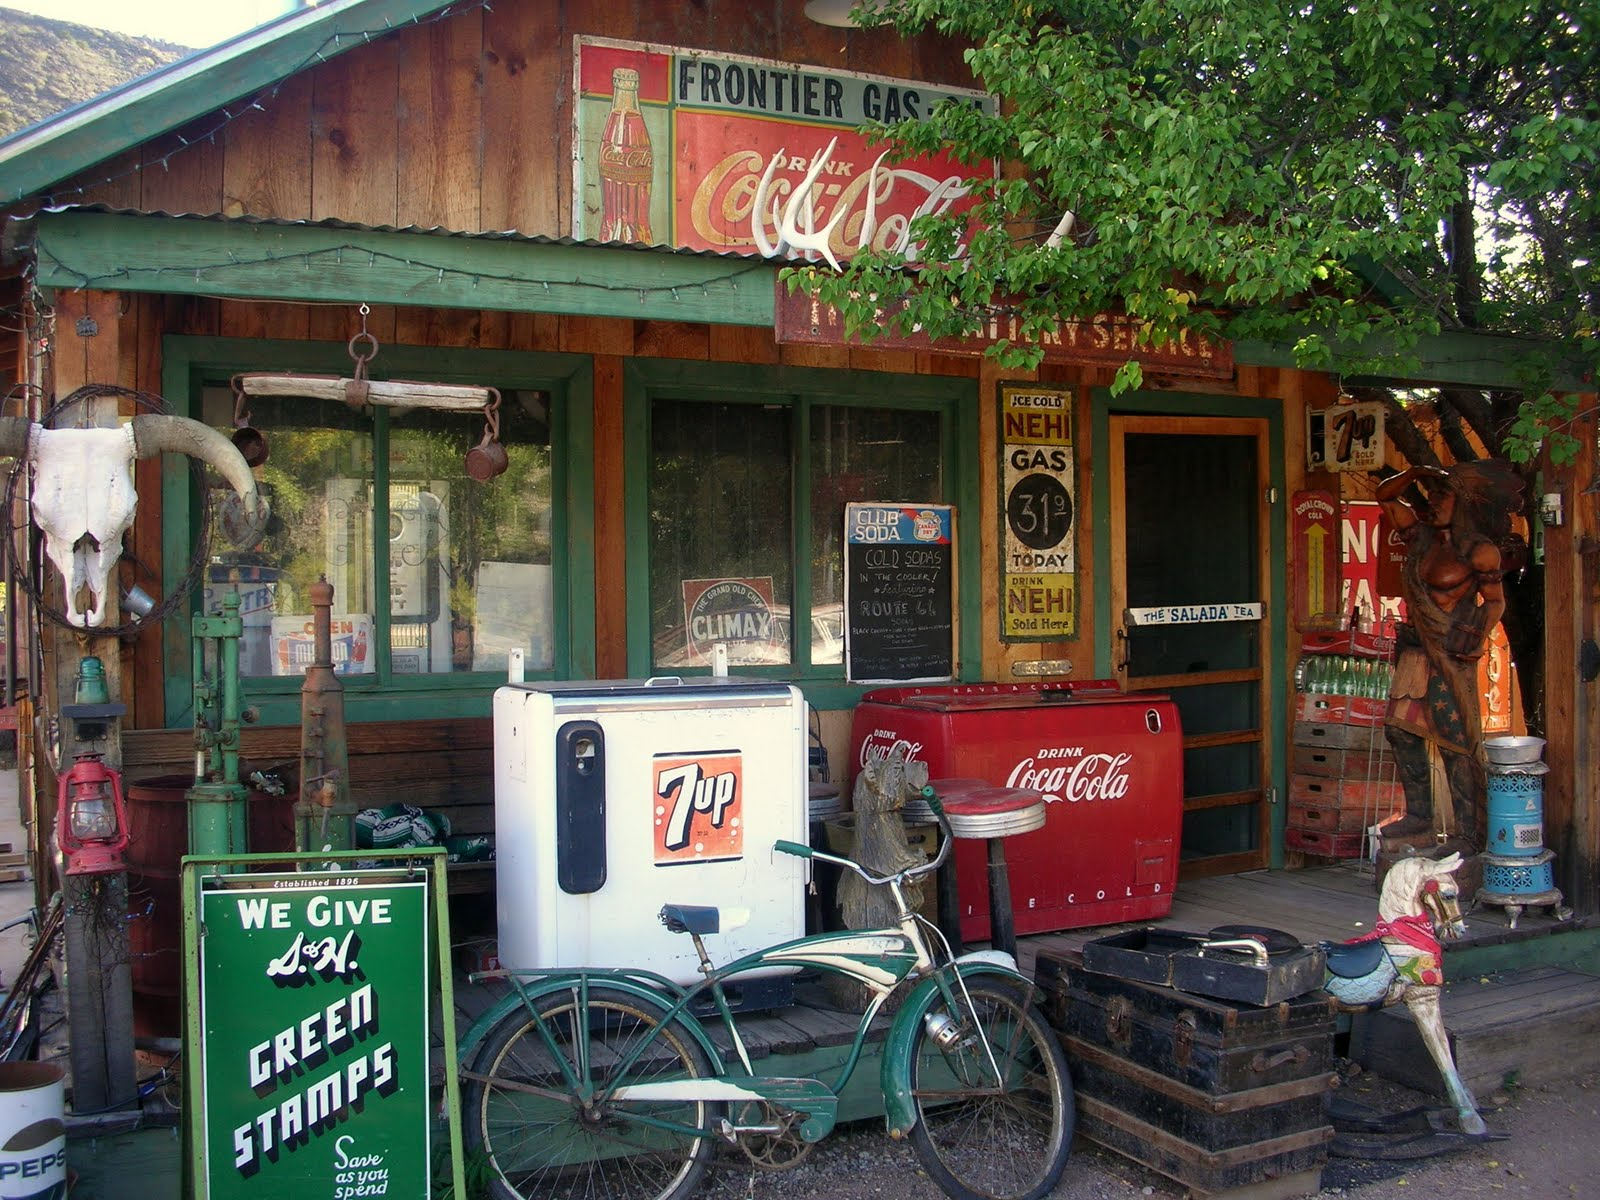 6e12fb8392d Neglected Beauty.: Roadside beauty: Embudo, NM Gas Station Museum